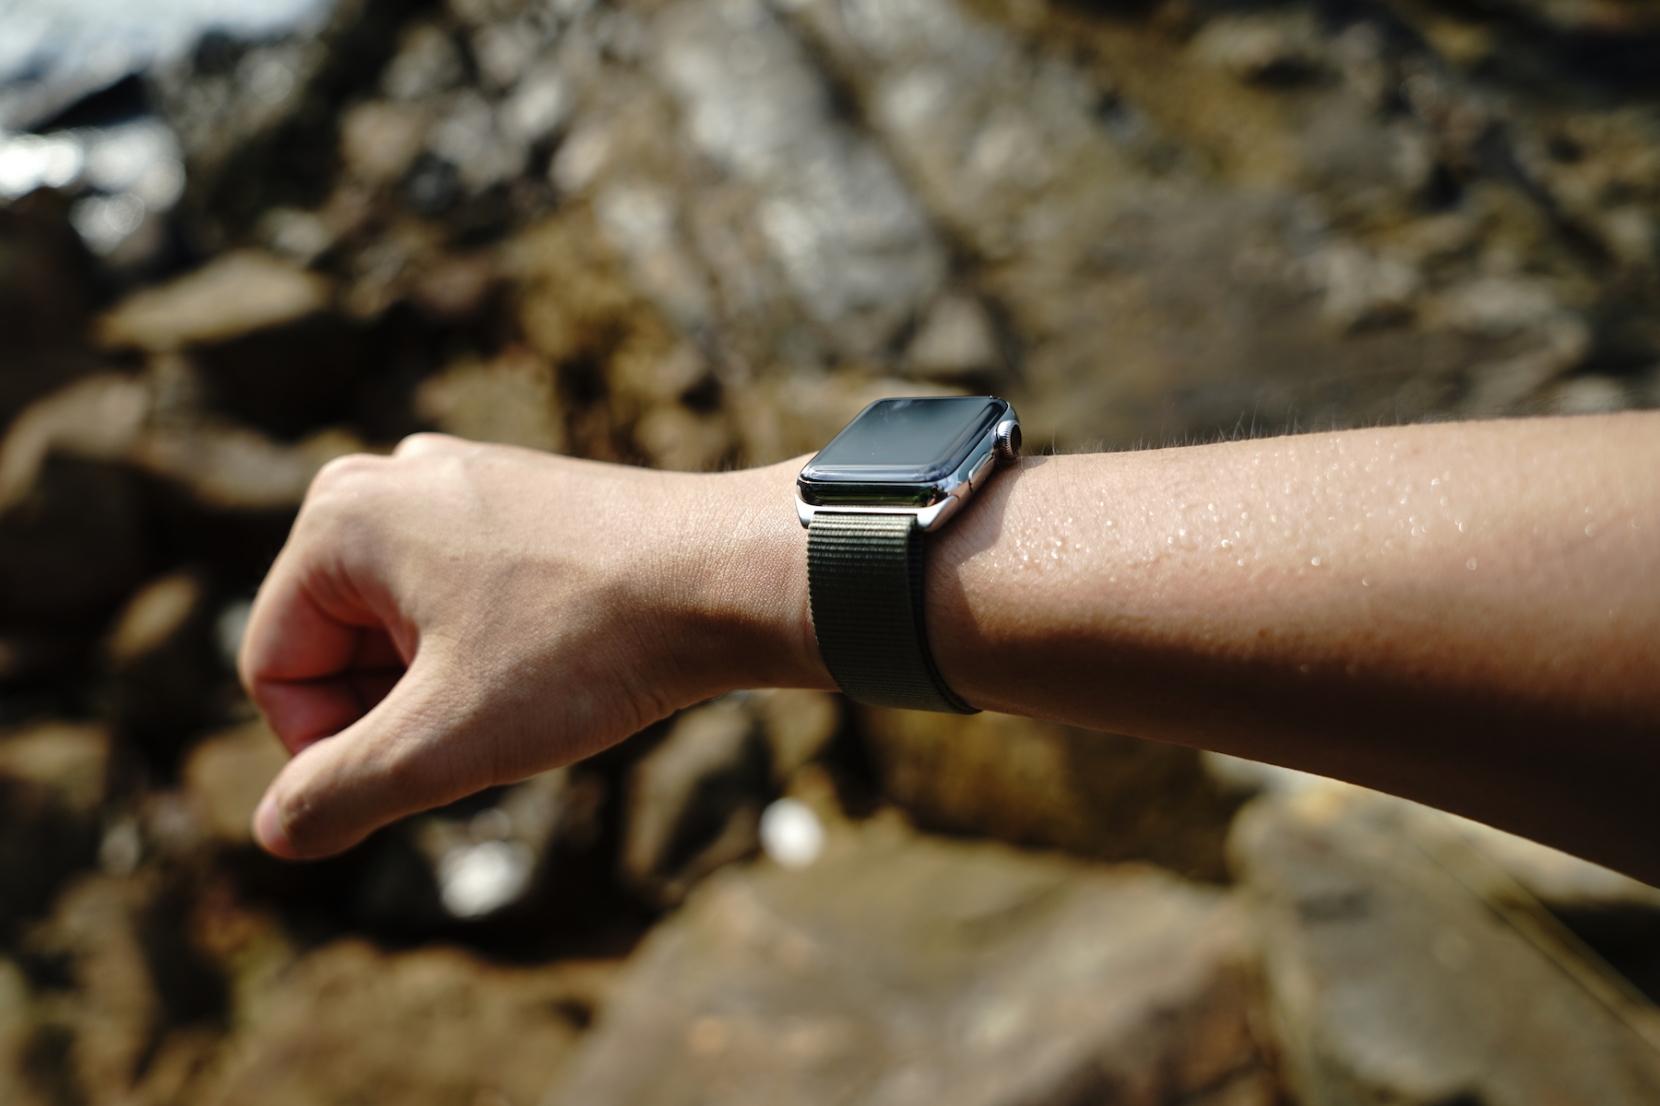 monowear-nylon-active-apple-watch-band-19